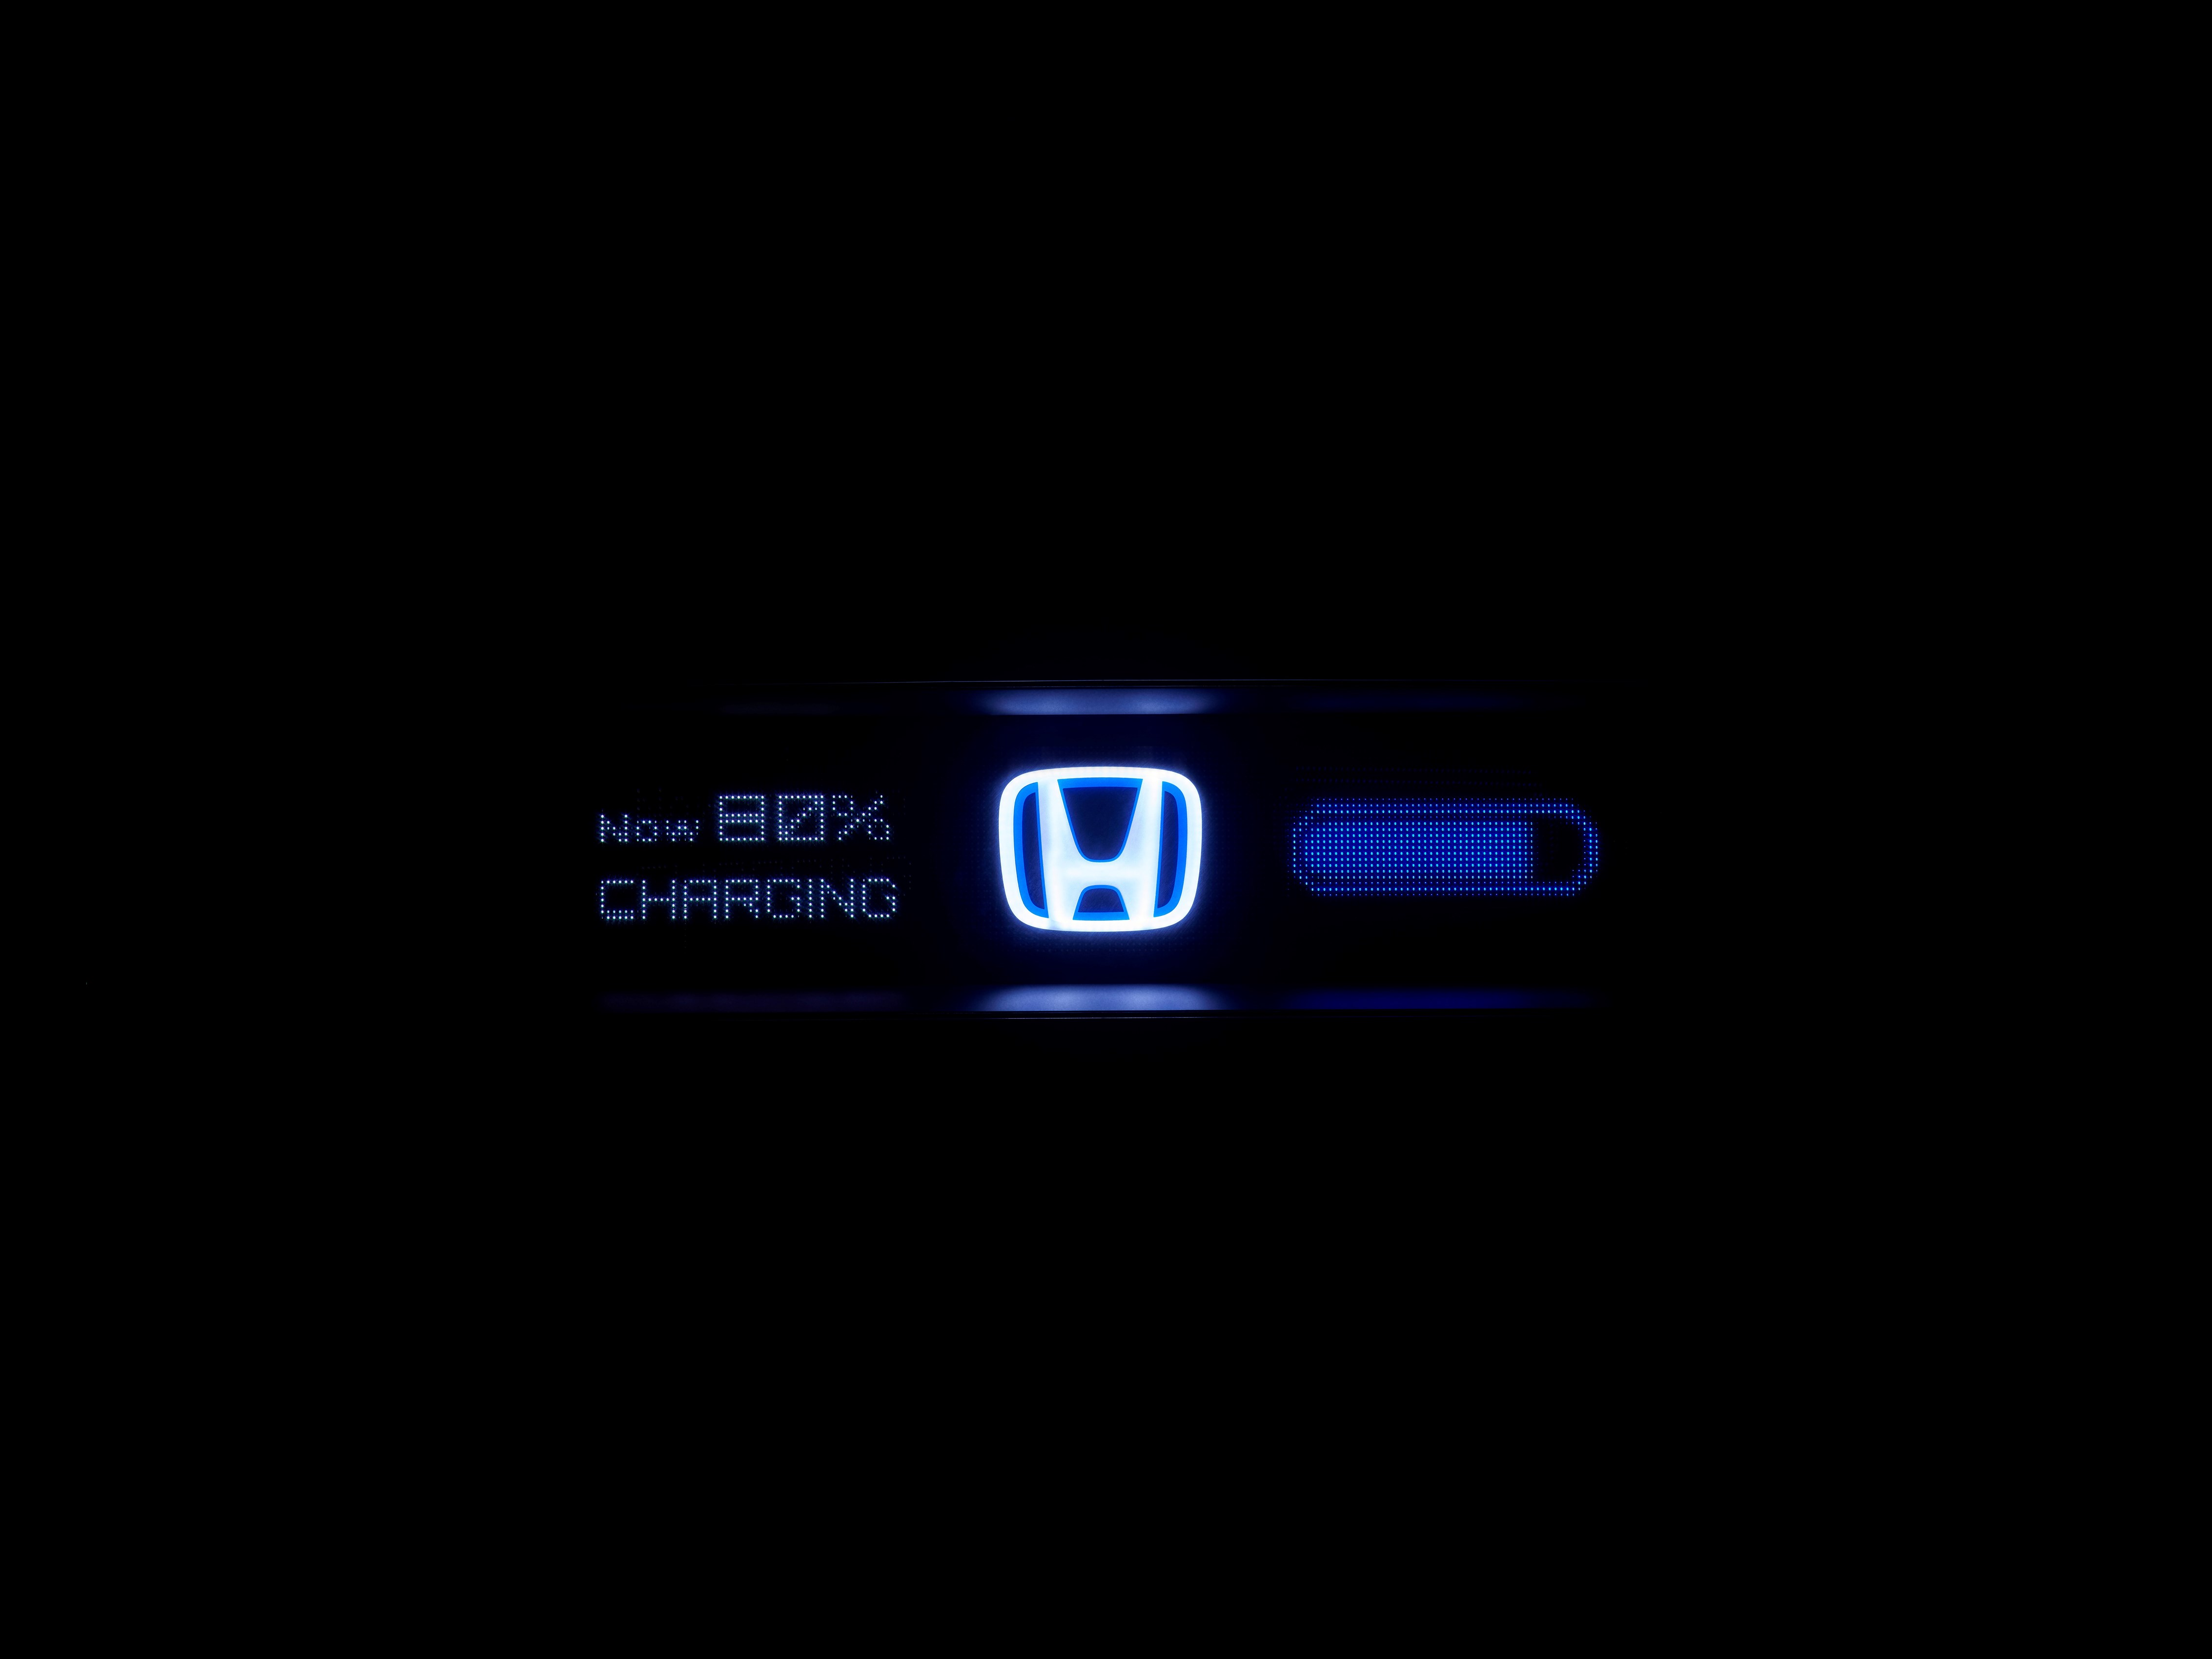 World premiere of the Honda Urban EV Concept – Honda's first EV for Europe